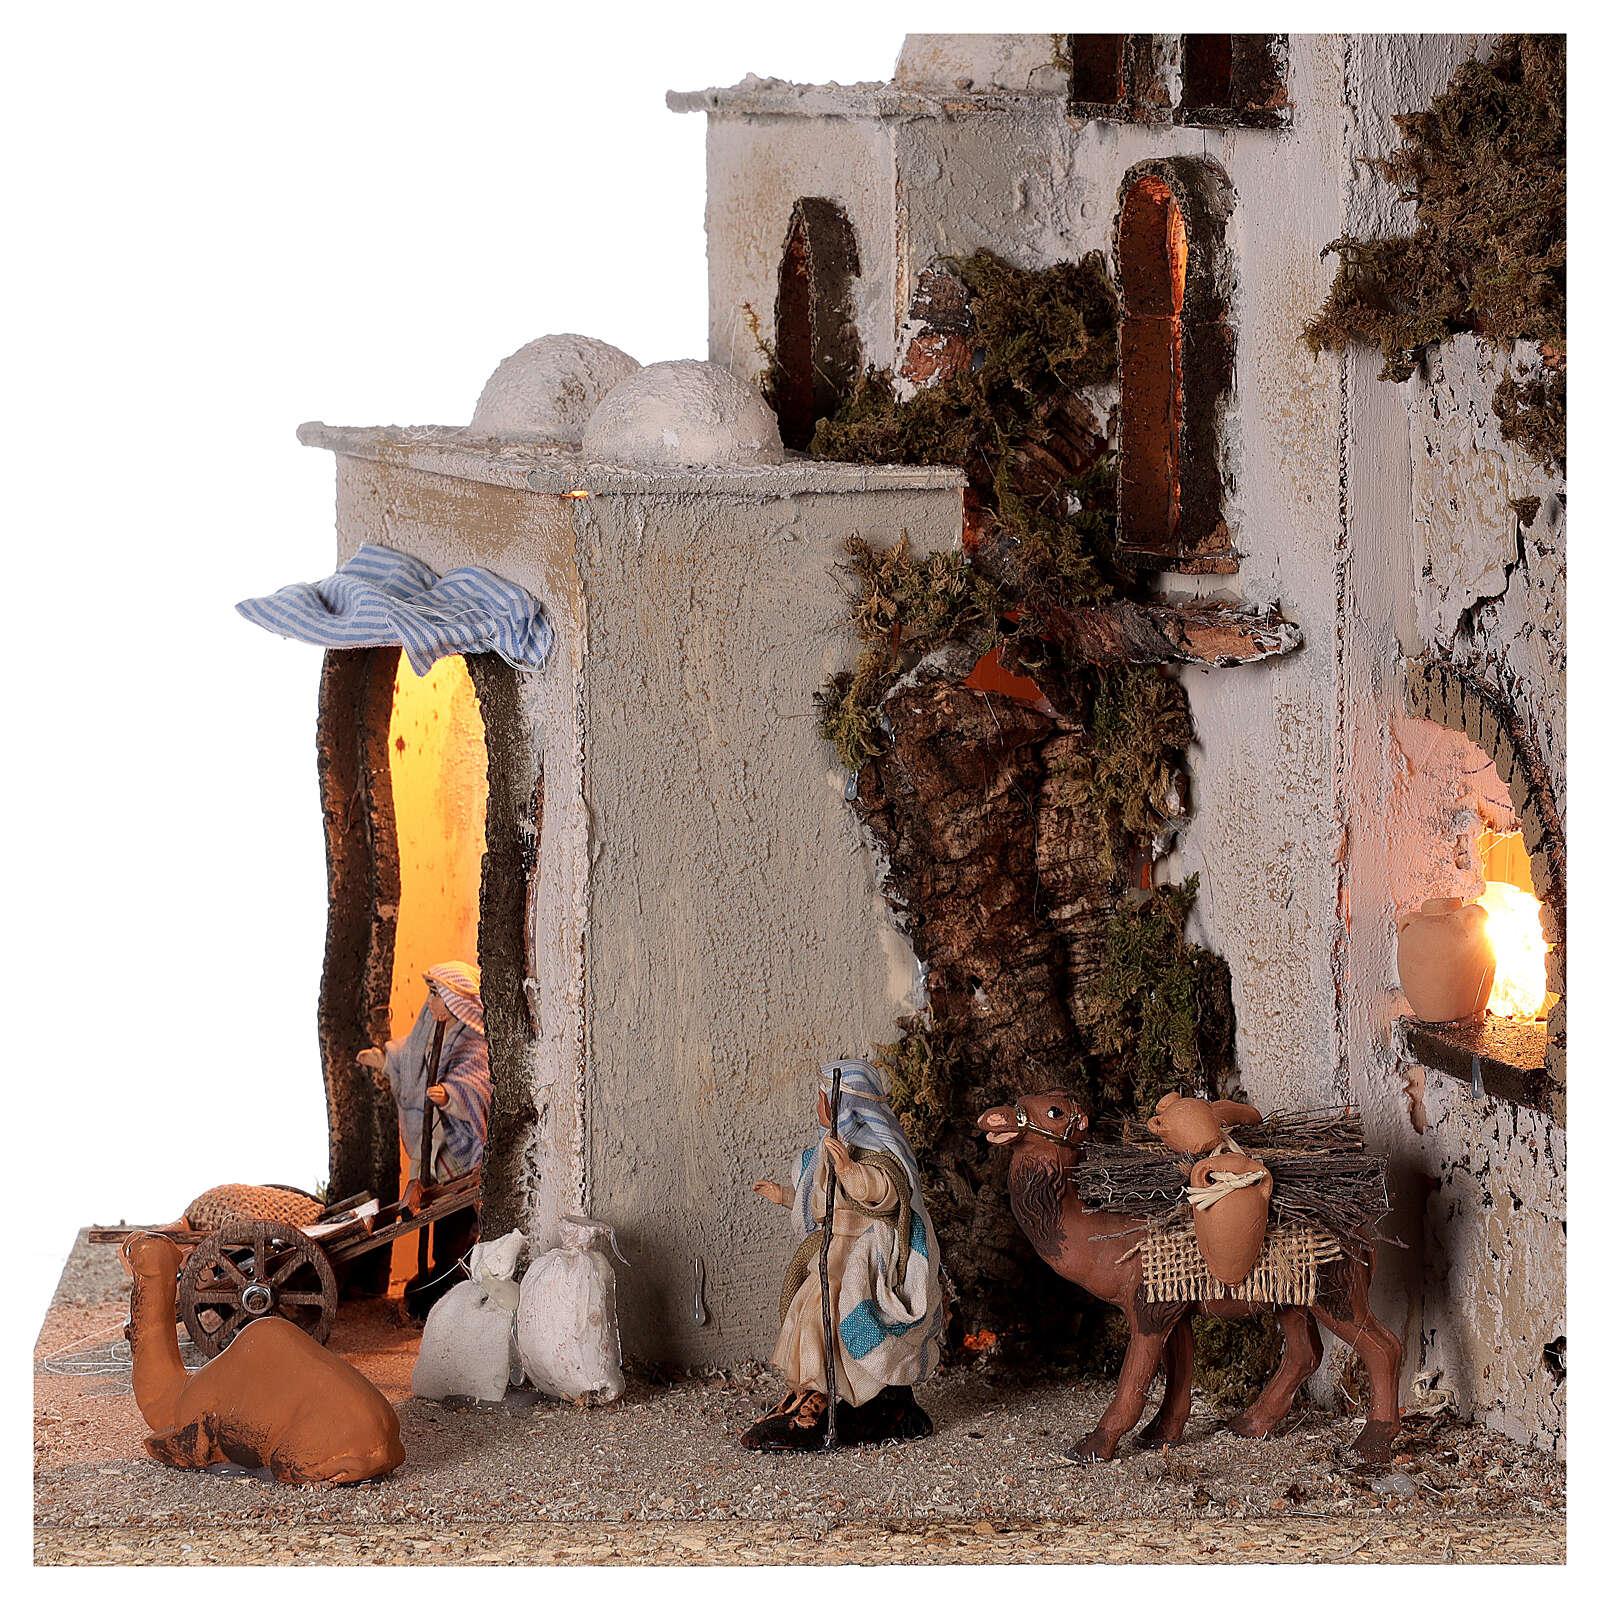 Borgo palestinese (C) statue terracotta 8 cm presepe napoletano 40x35x35 illuminato 4